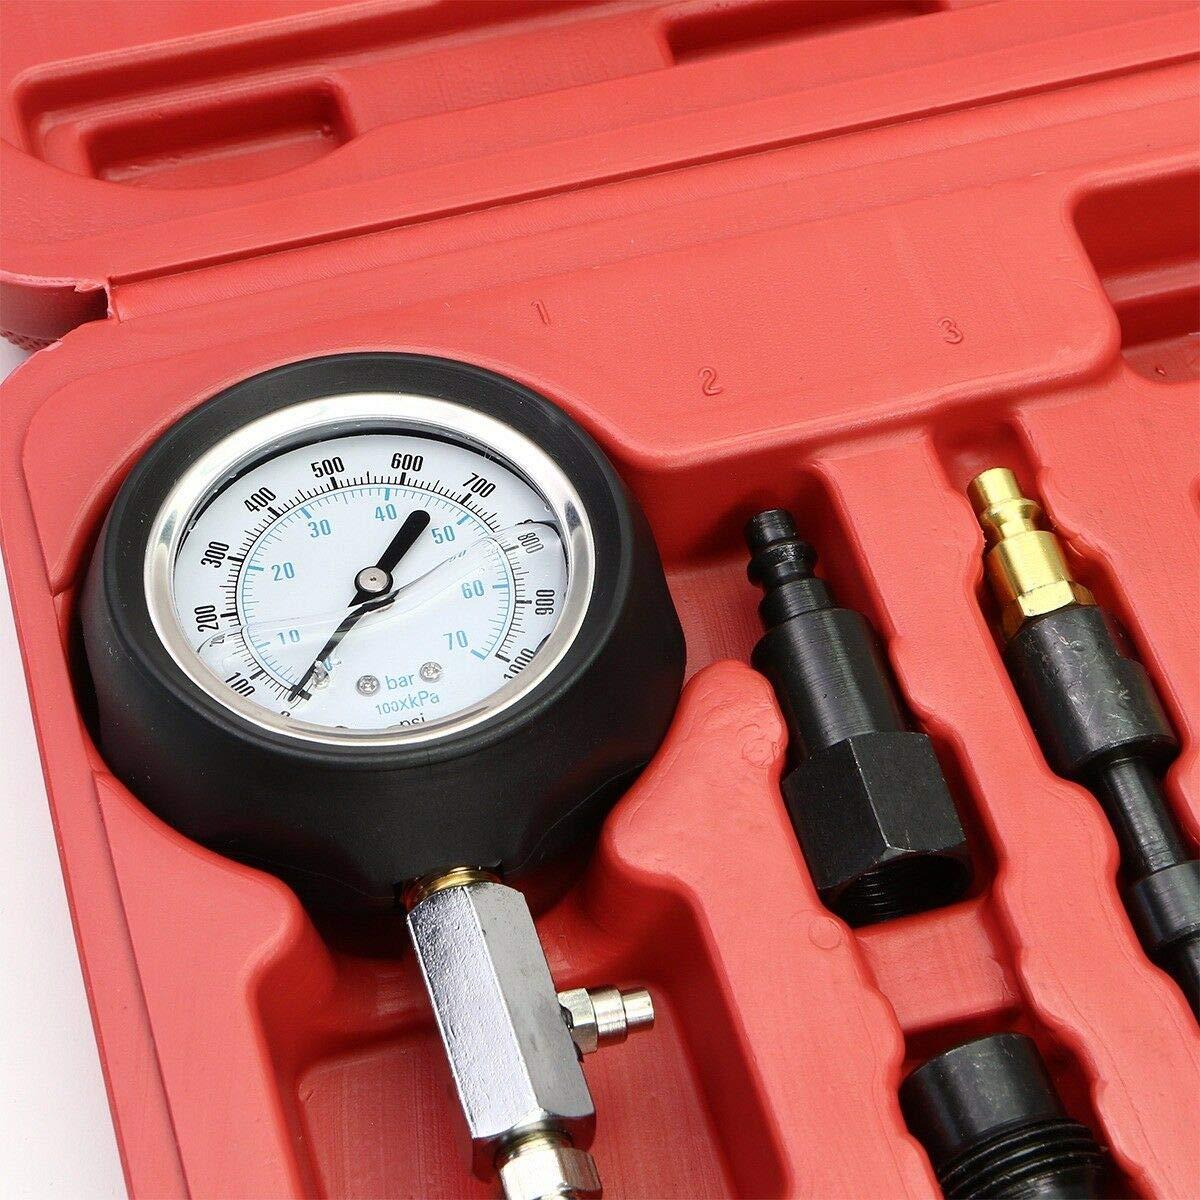 XtremepowerUS 14 Piece Professional Diesel Engine Compression Tractor Semi Tester Test Set Kit